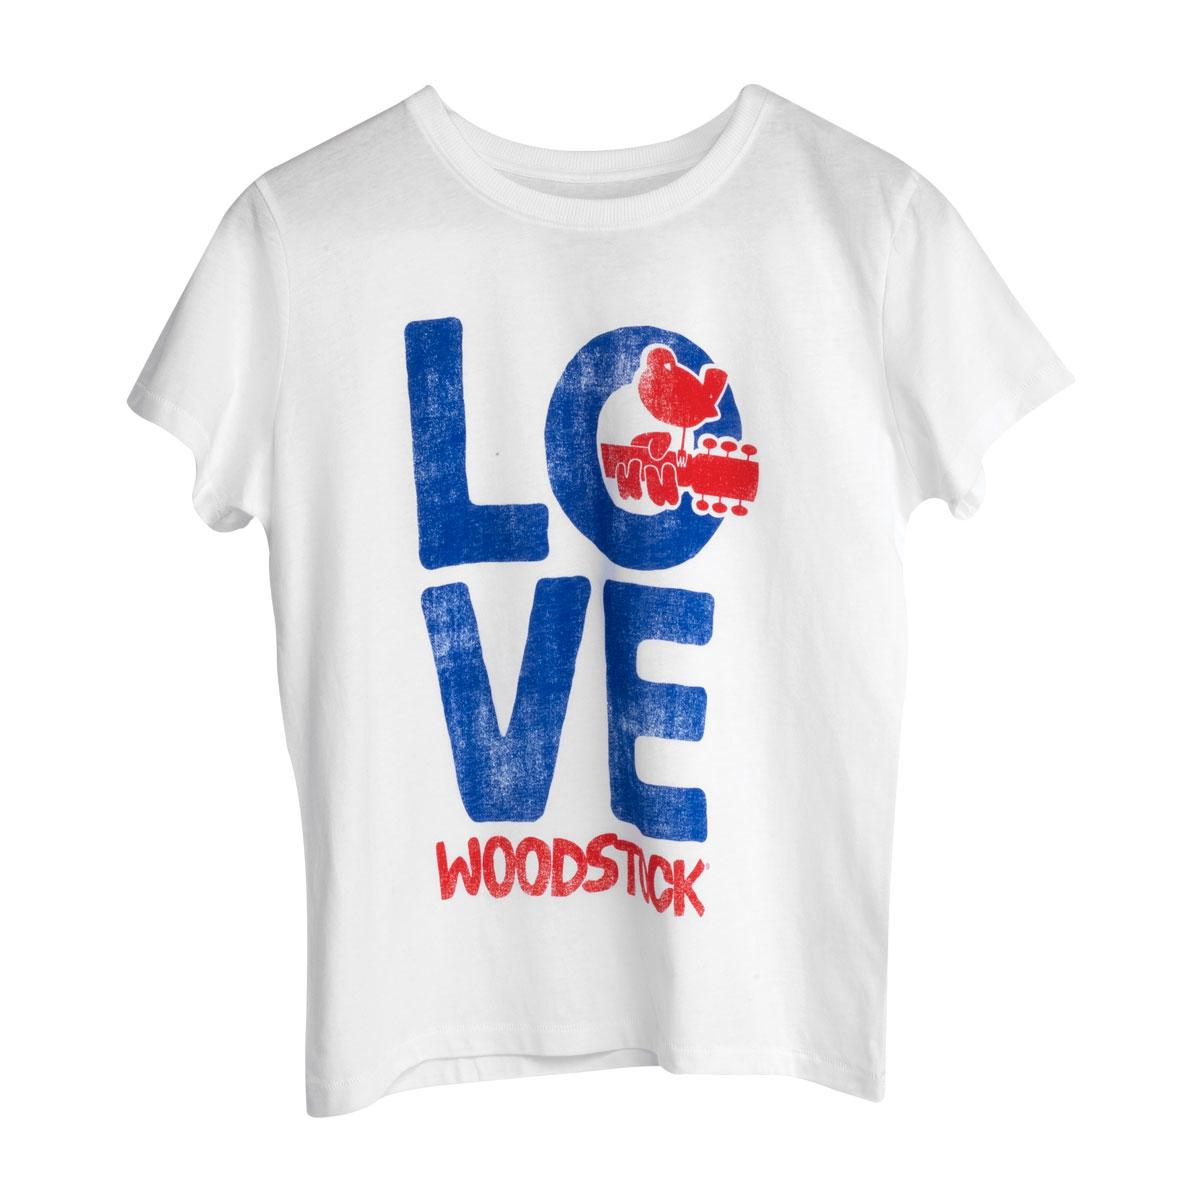 Woodstock LOVE Youth White T-shirt